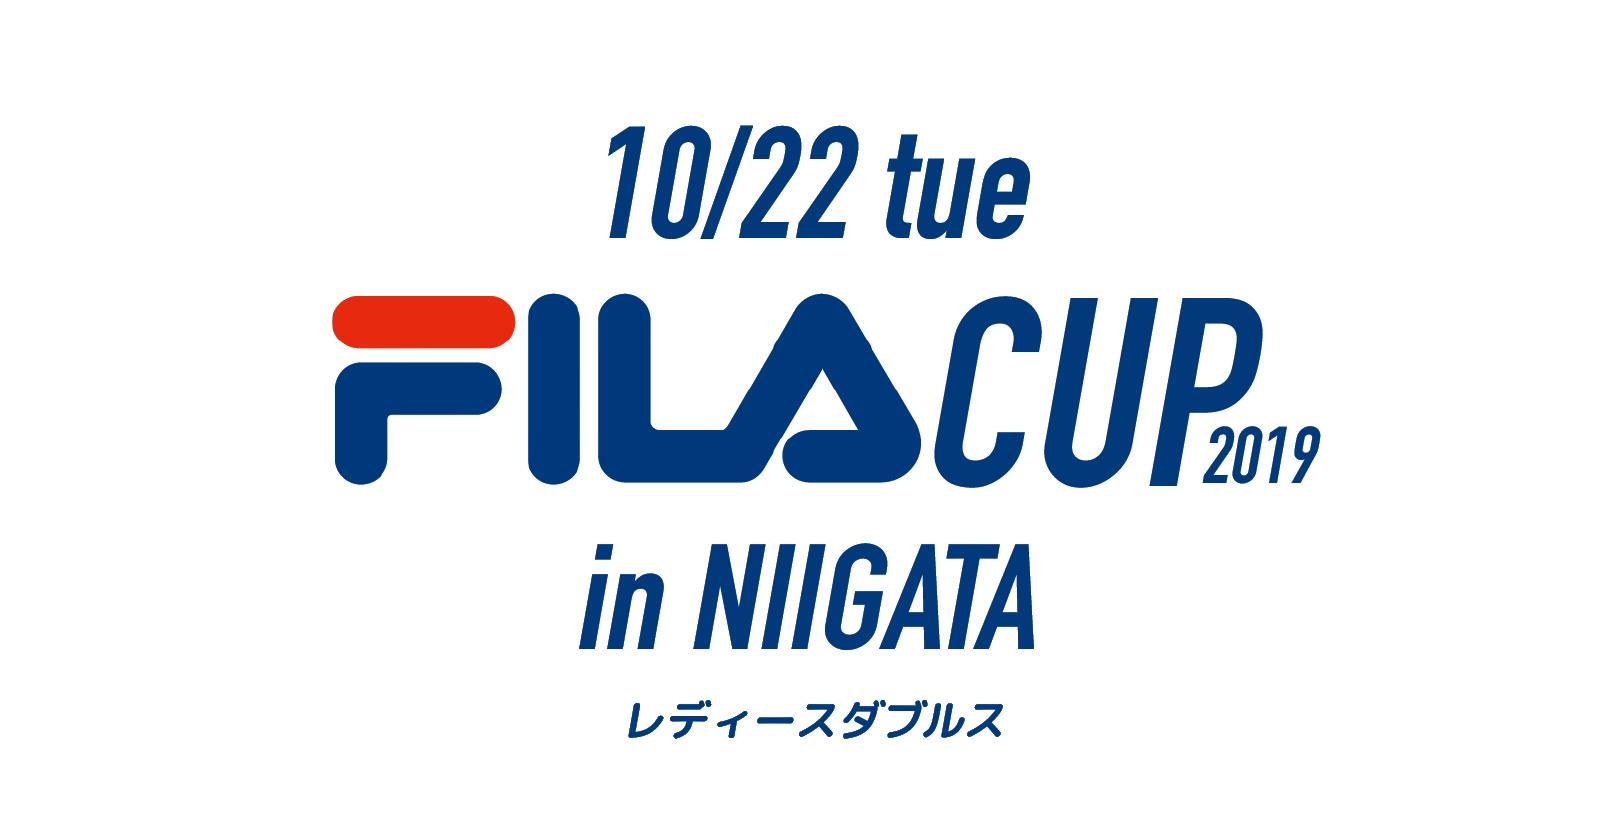 FILA CUP 2019 in NIIGATA 10月22日(火)